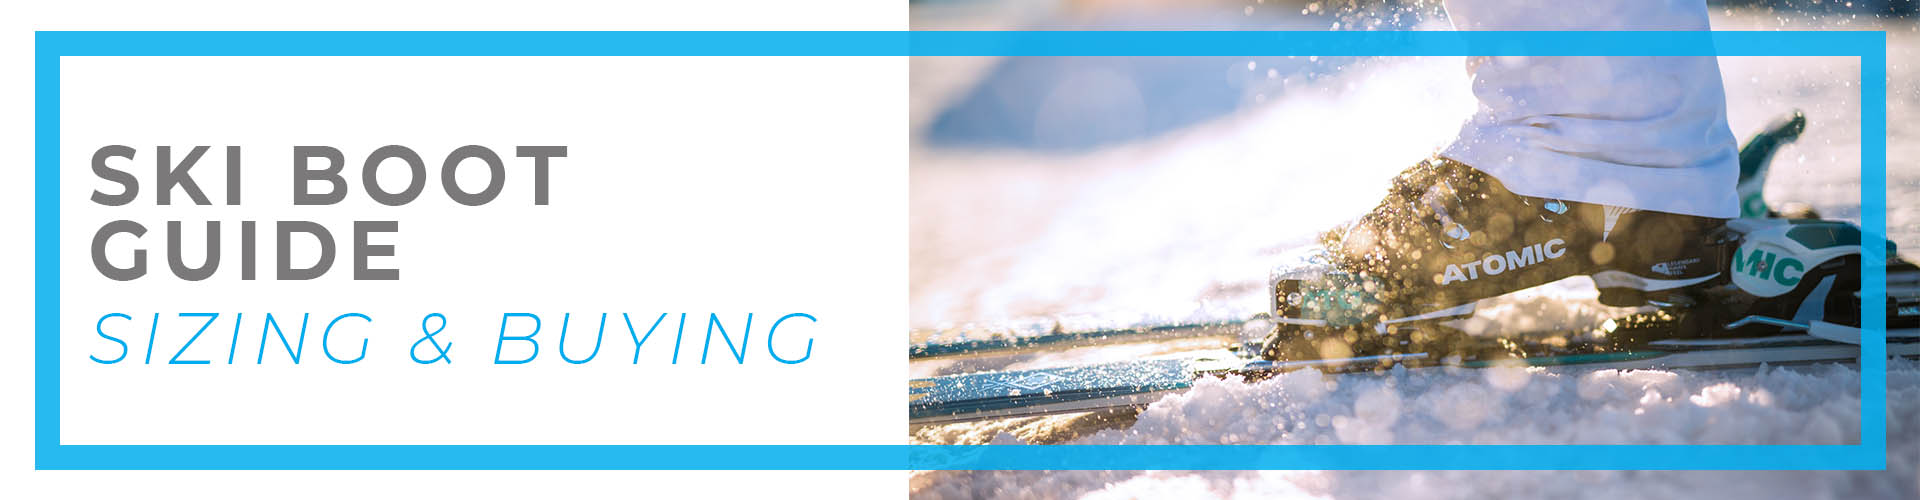 skiboot-buyingguide-banner-1920x500.jpg